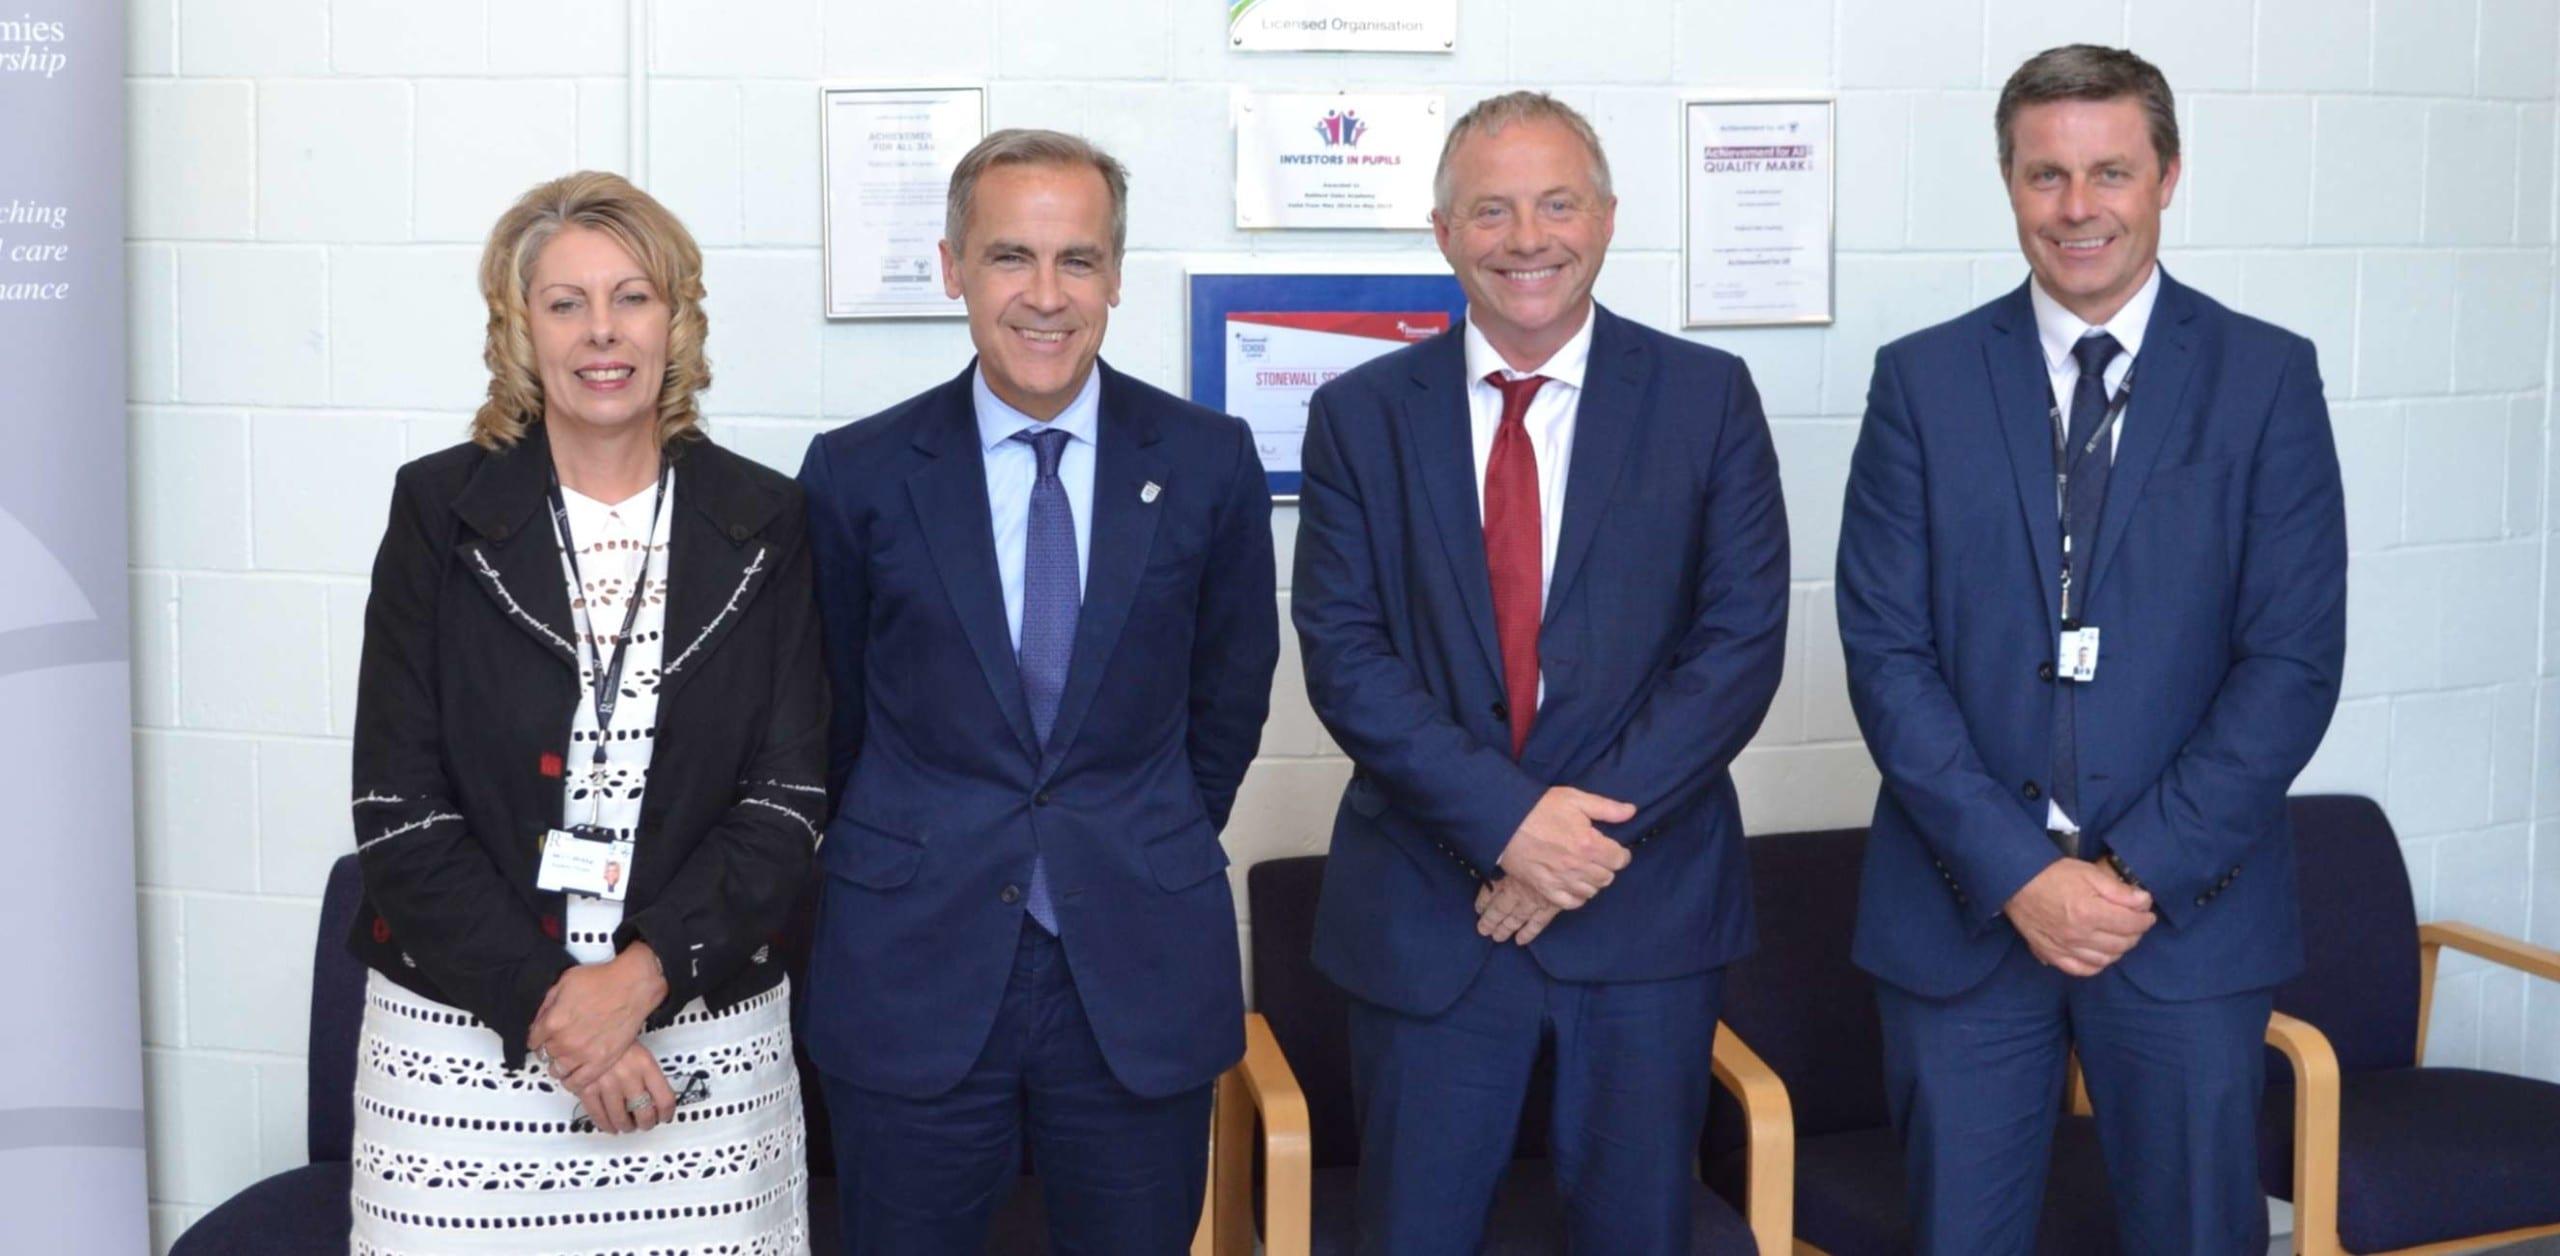 Bank of England Governor visits Retford Oaks Academy